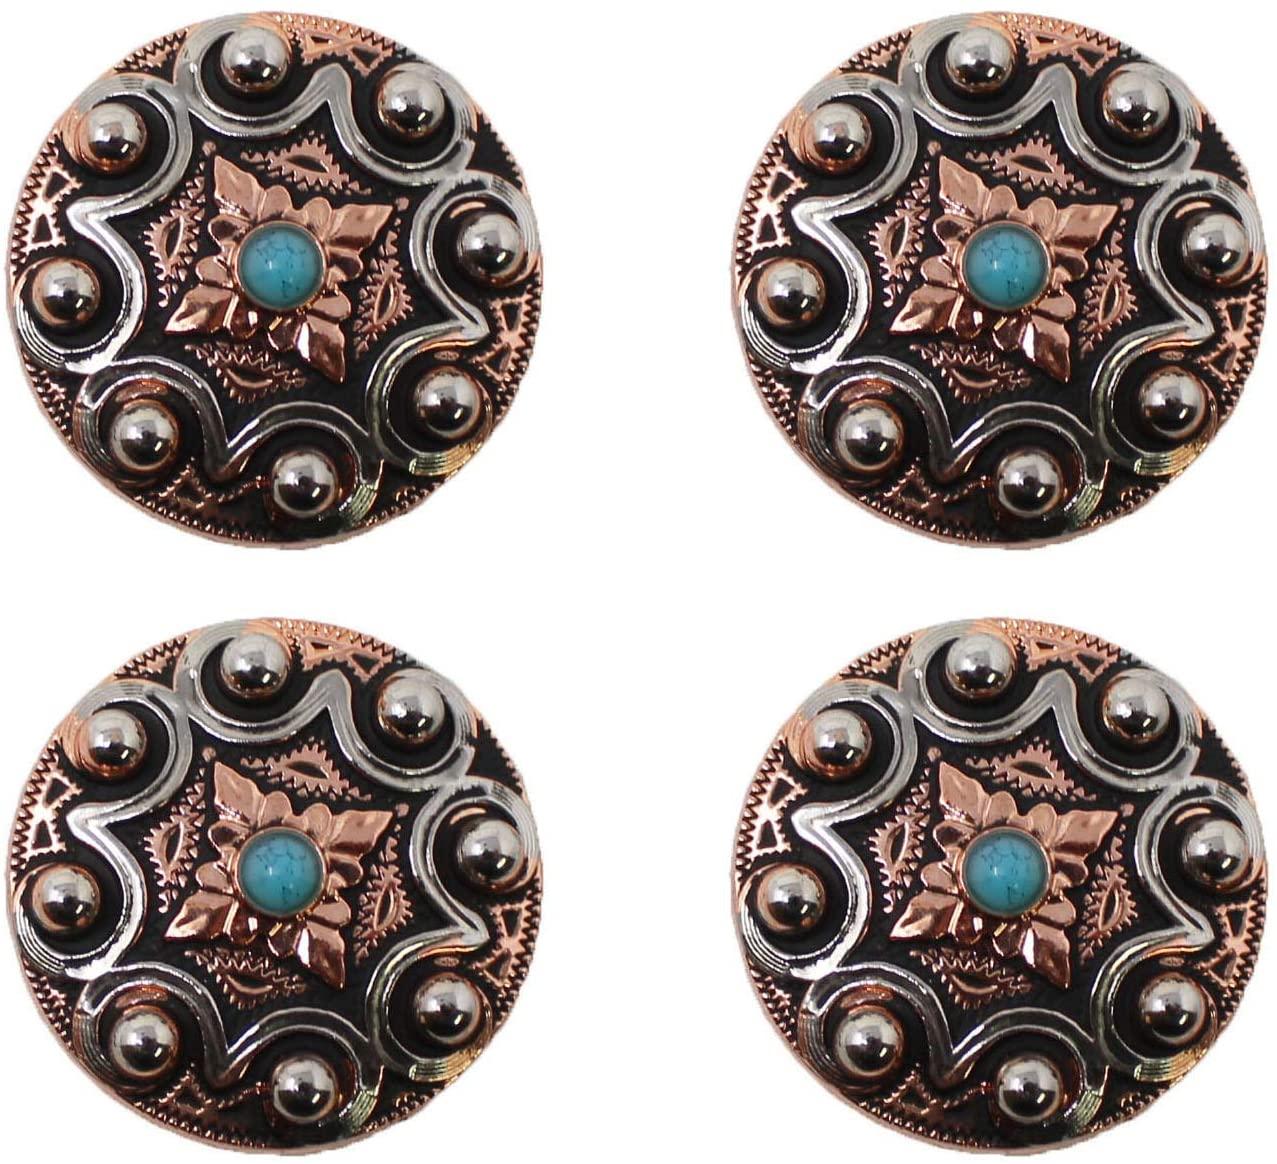 CHALLENGER Set of 4 Conchos Western Saddle Tack Engraved Copper Co553